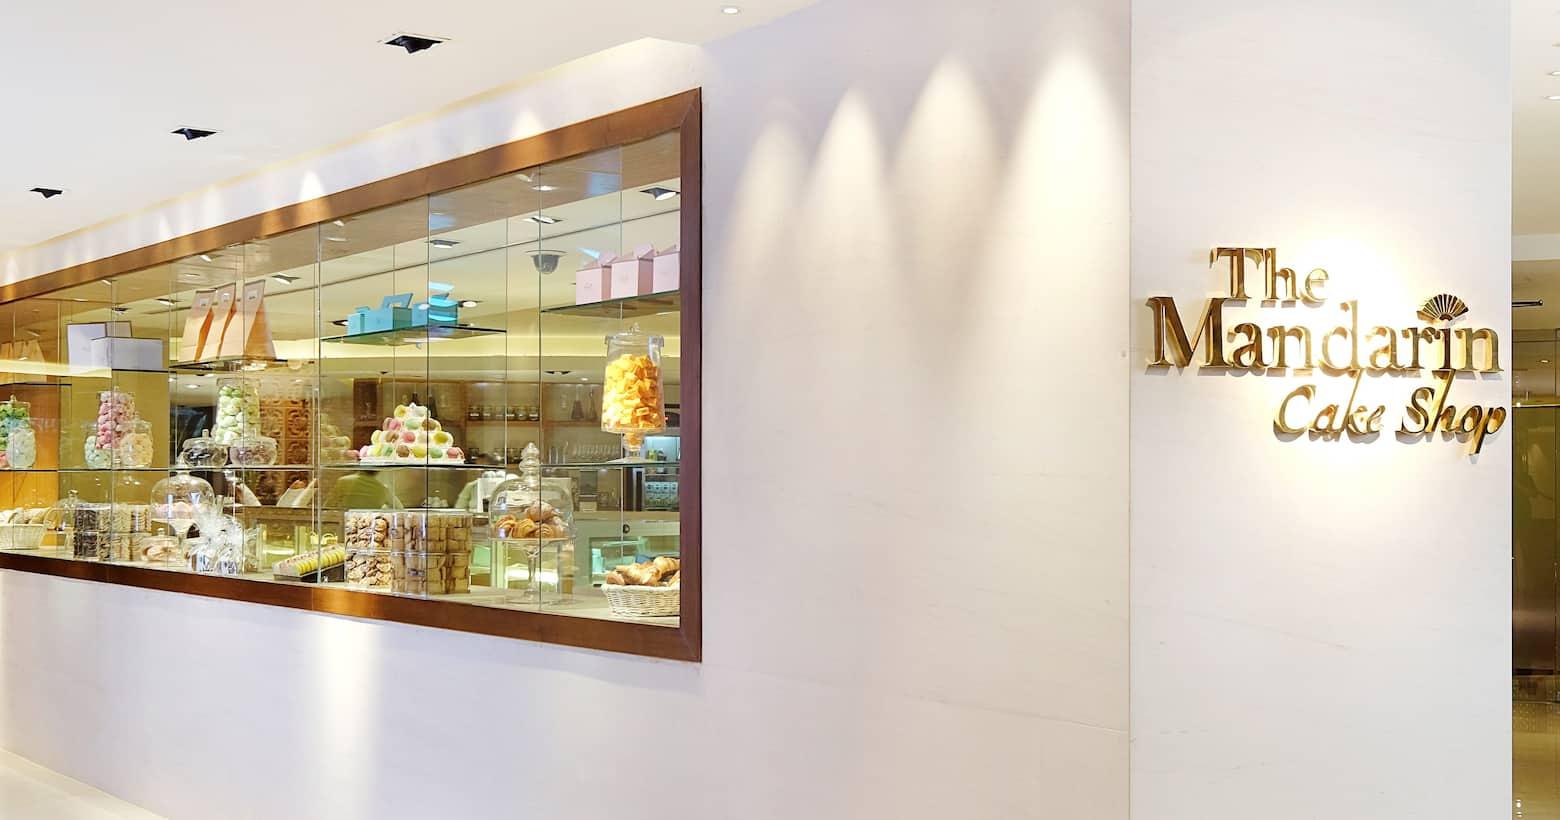 The Mandarin Cake Shop entrance